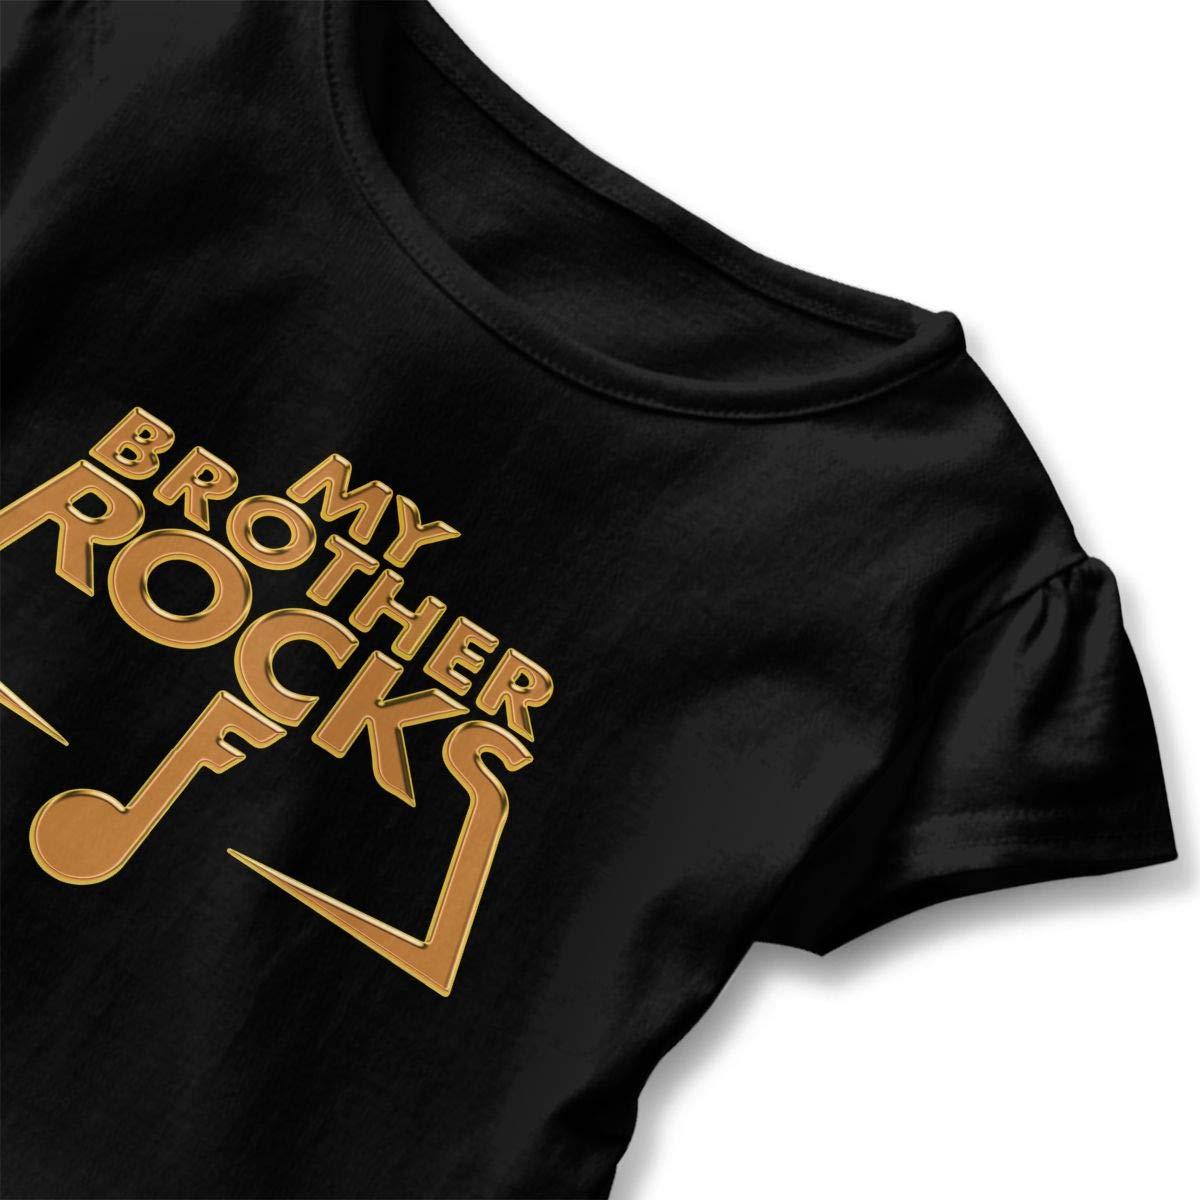 My Brother Rocks Heavy Metal Toddler Girls T Shirt Kids Cotton Short Sleeve Ruffle Tee